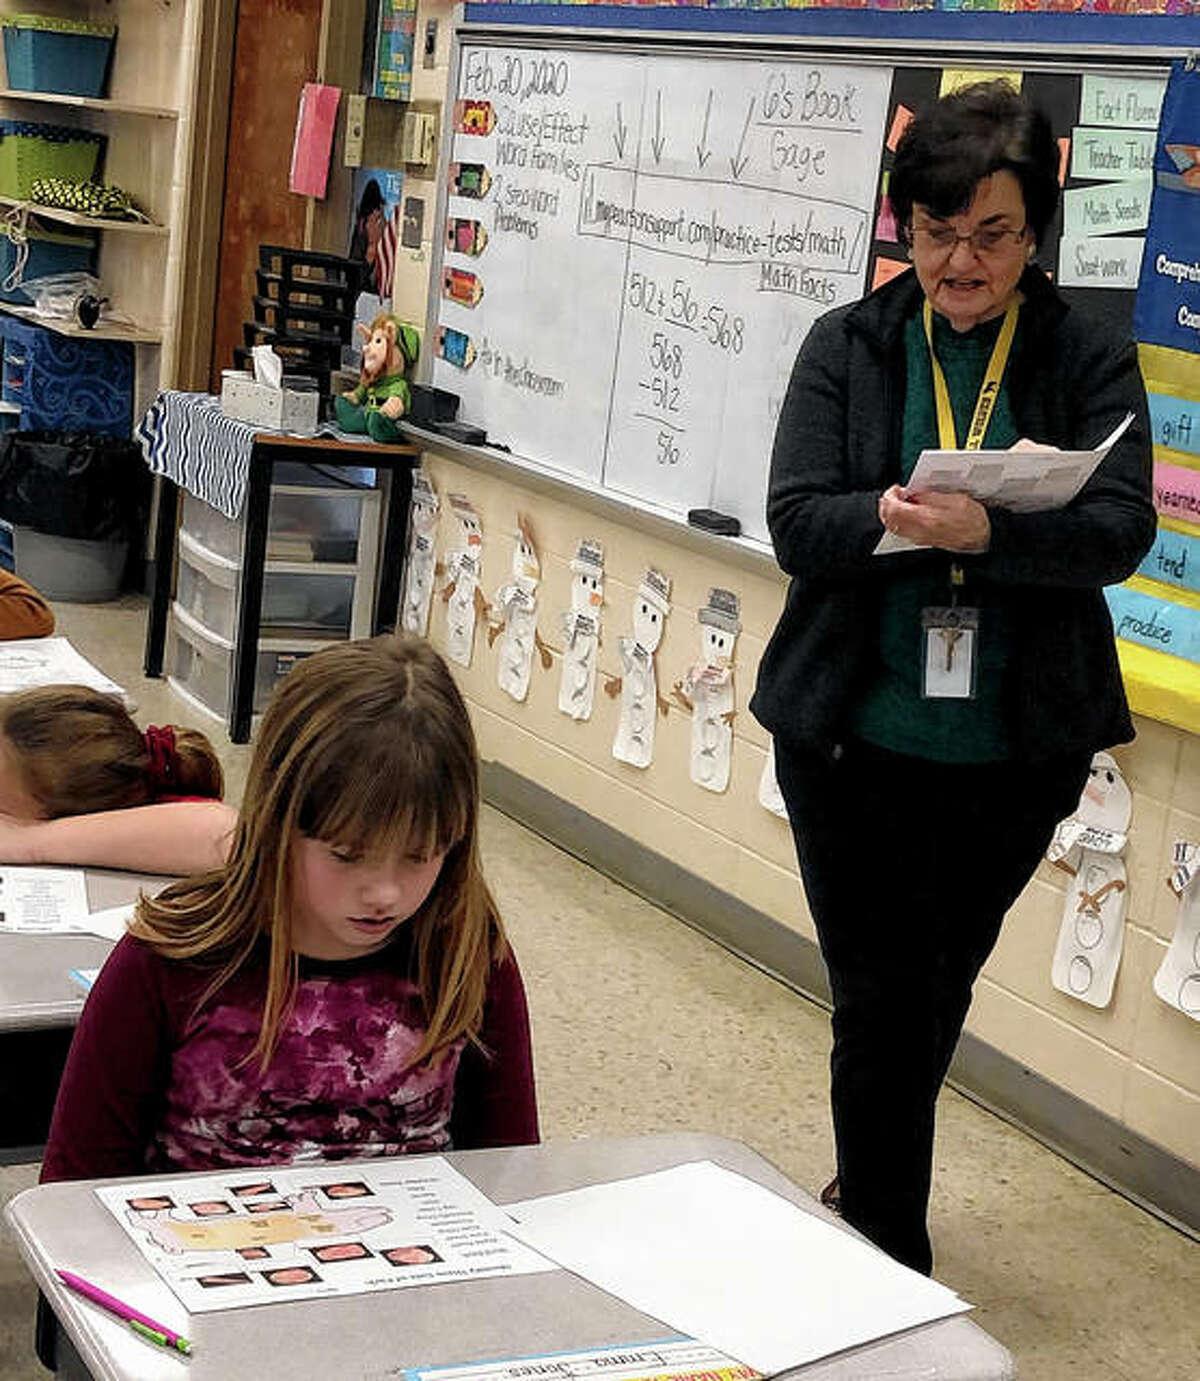 Volunteer Sharon Van Dyne (right) helps student Emma Jones with her worksheet on pork cutlets.